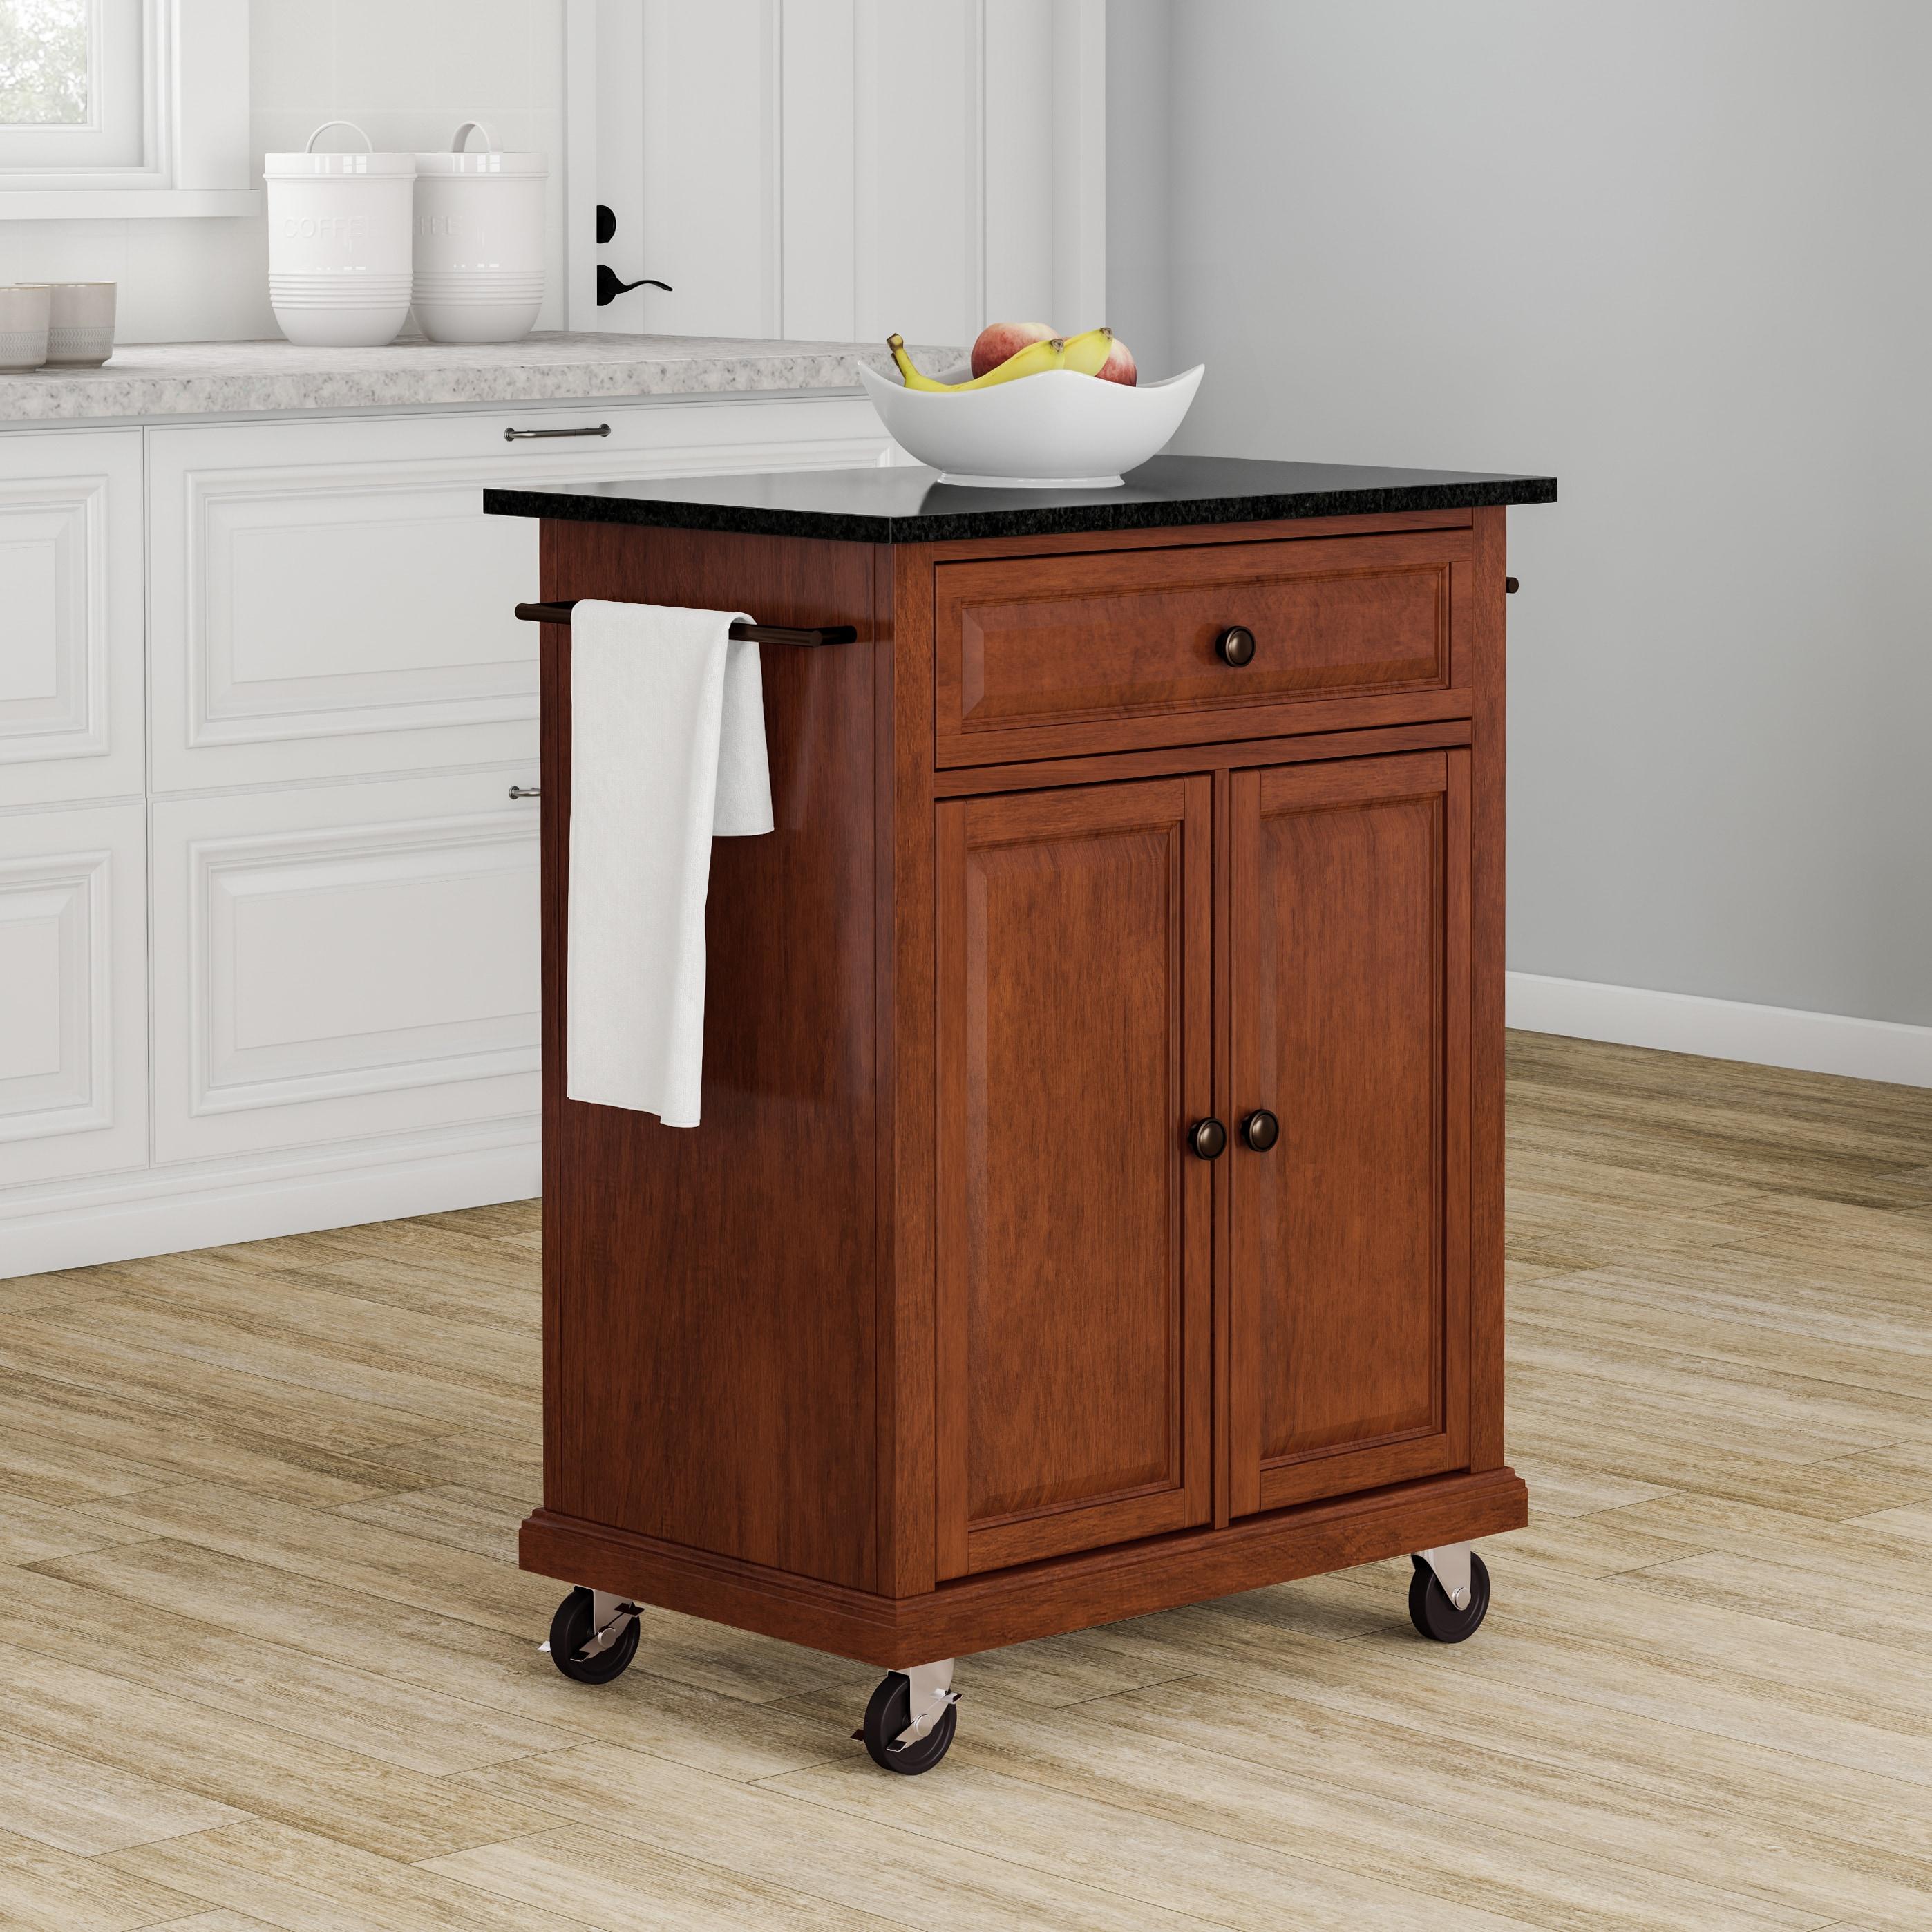 Copper Grove Kawartha Solid Black Granite Top Portable Kitchen Cart/ Island  in Classic Cherry Finish